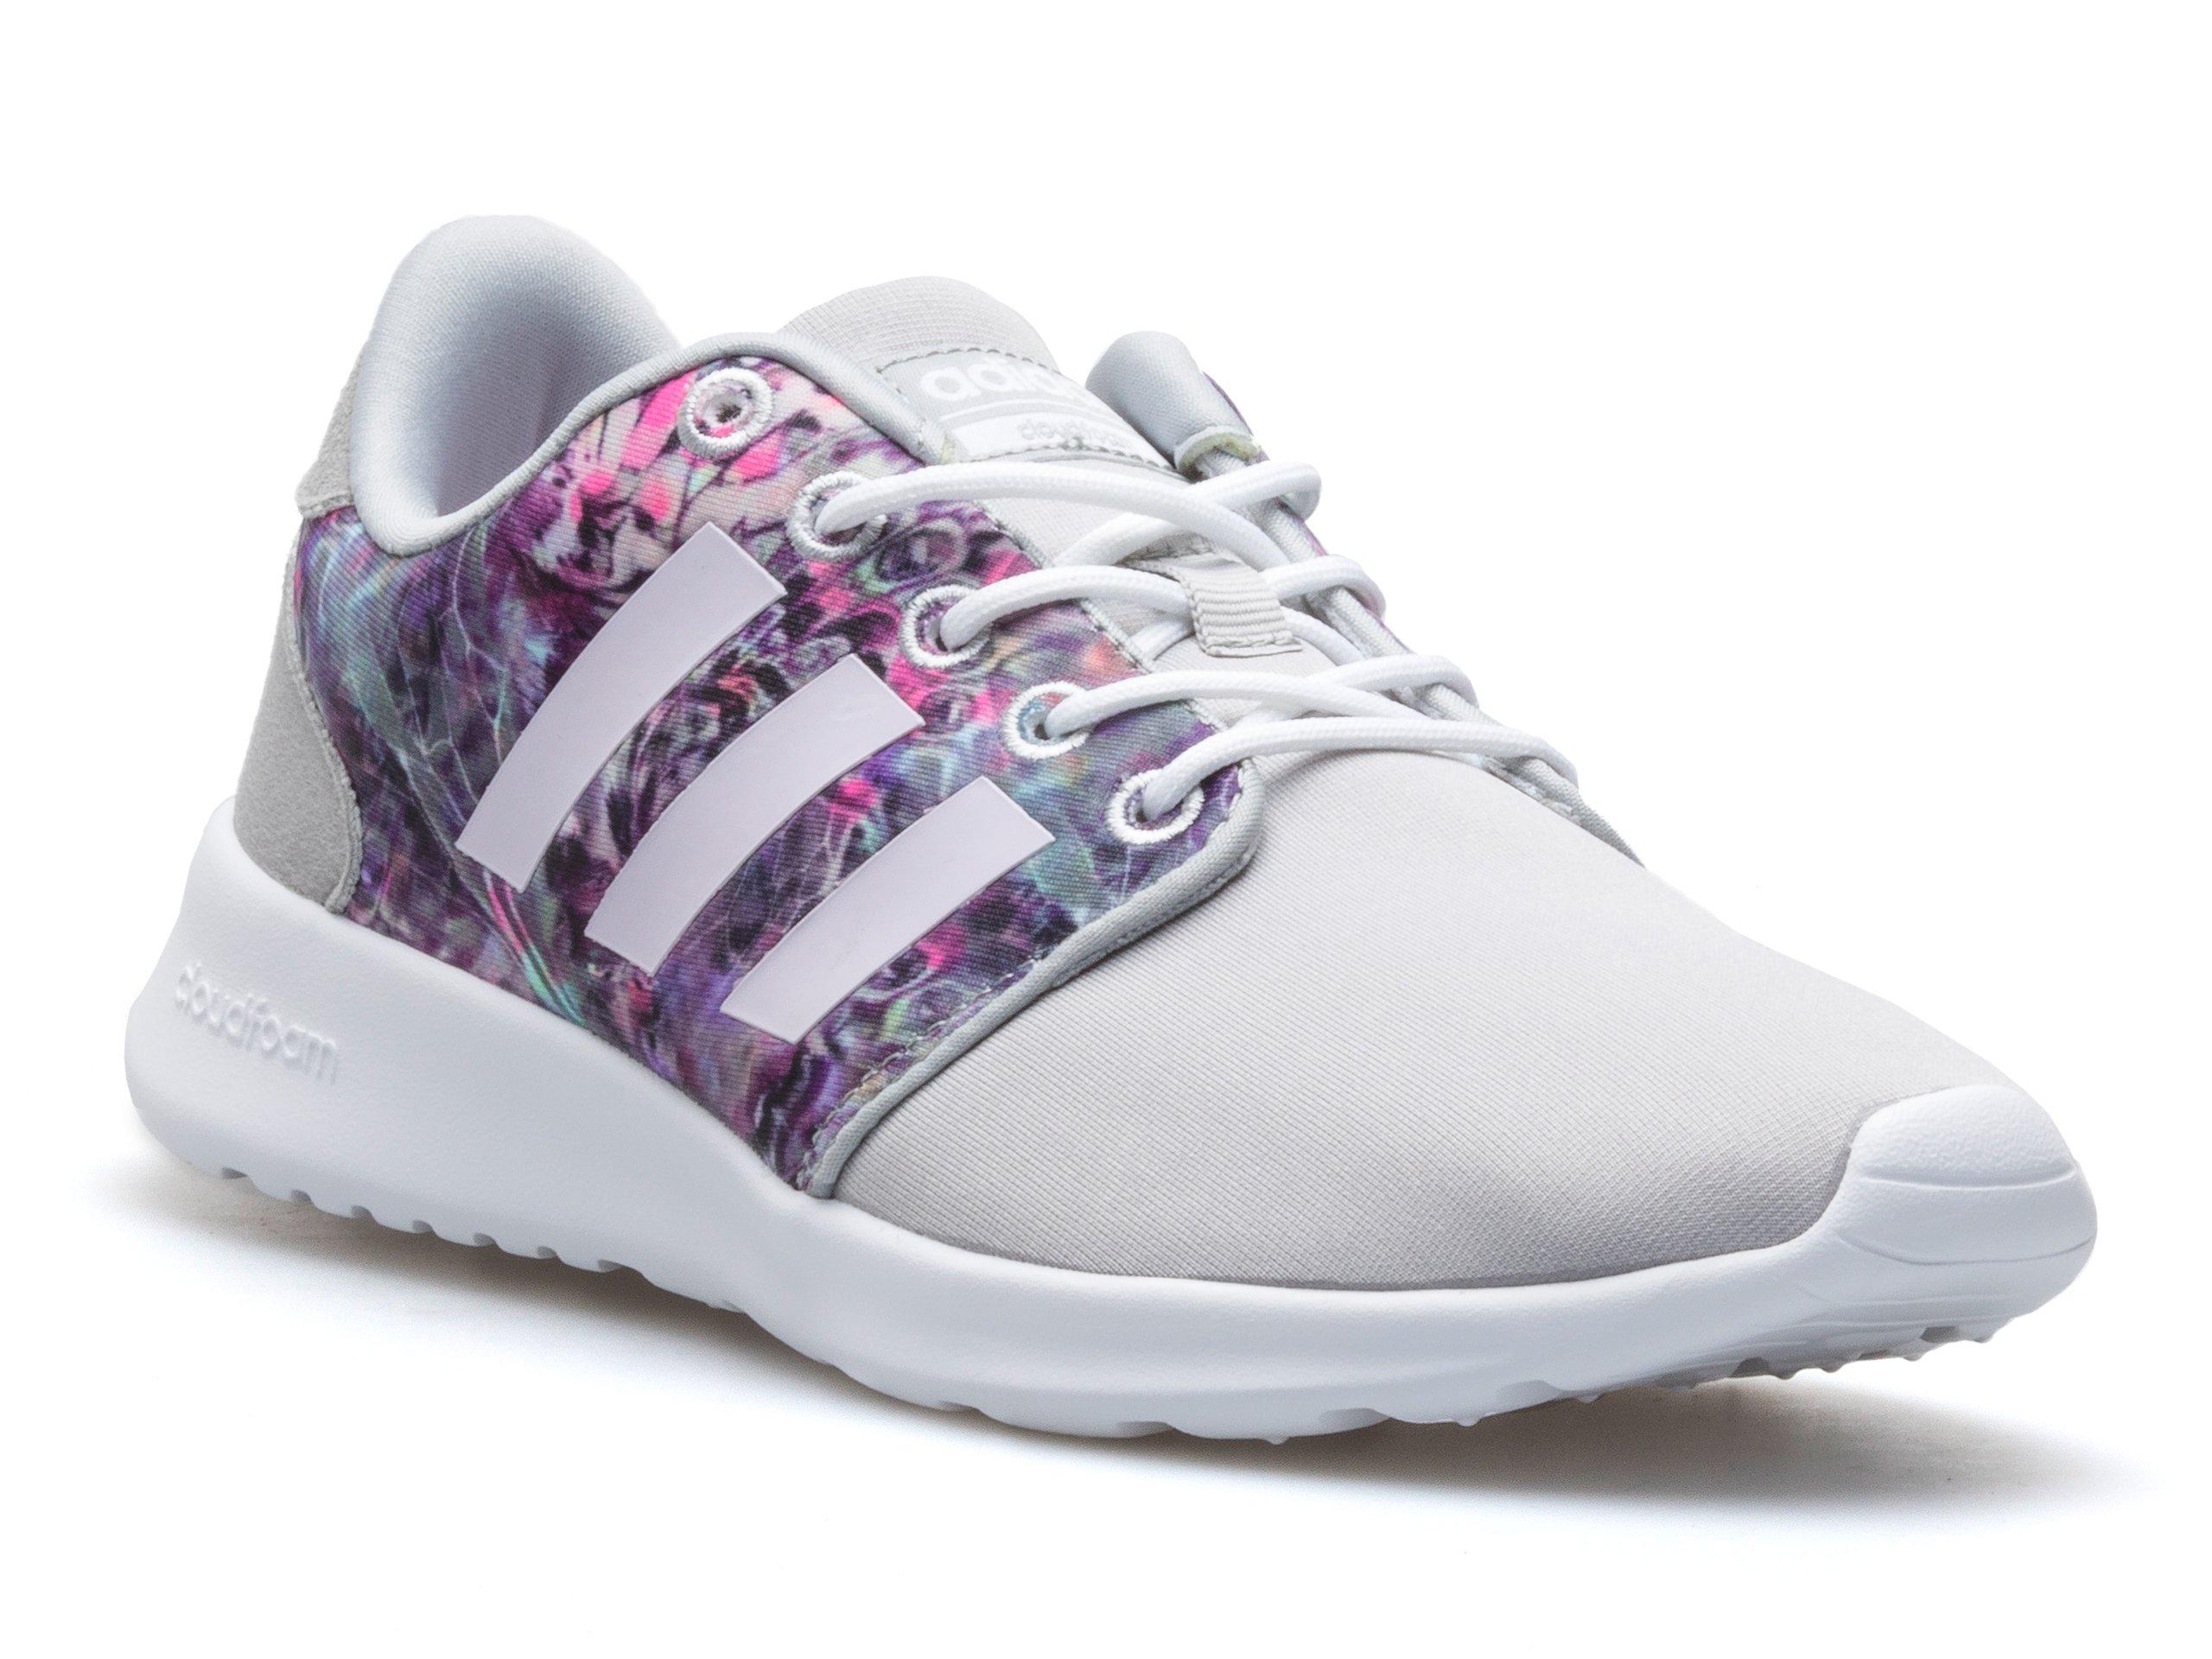 Buty damskie adidas CLOUDFOAM QT AW4008 r. 38 23